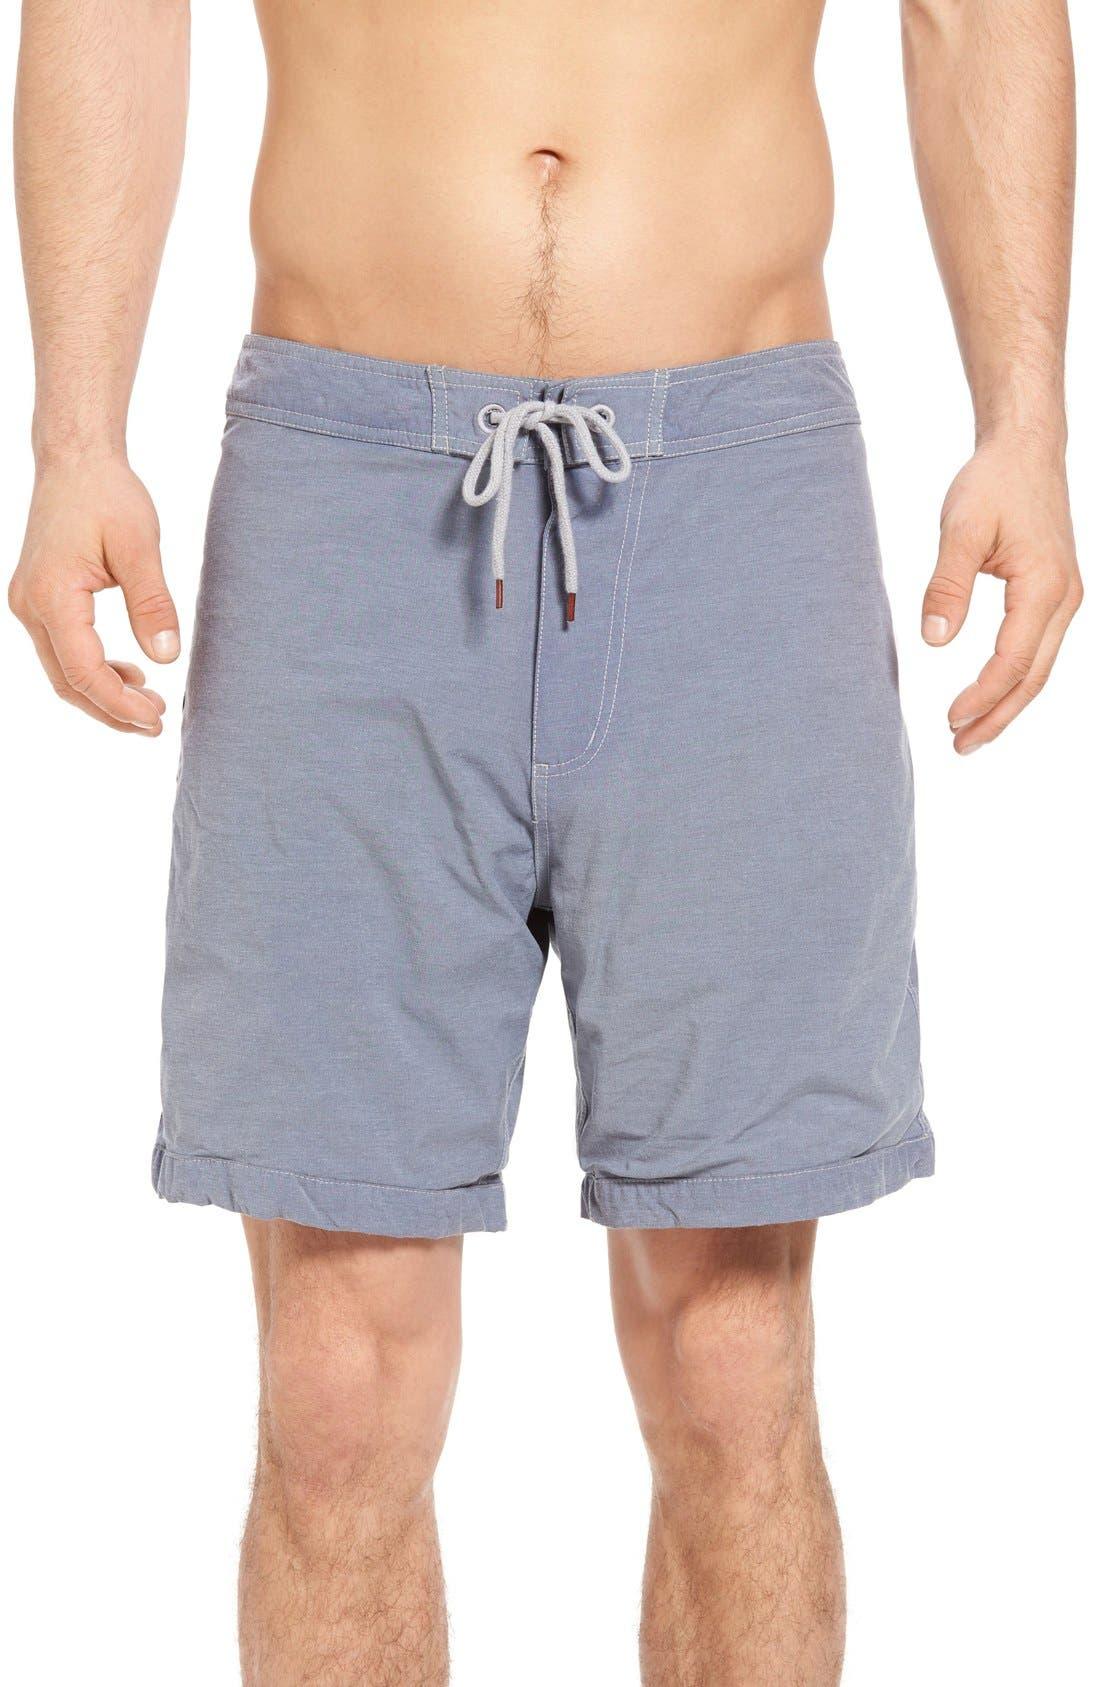 Venice Board Shorts,                         Main,                         color, 029